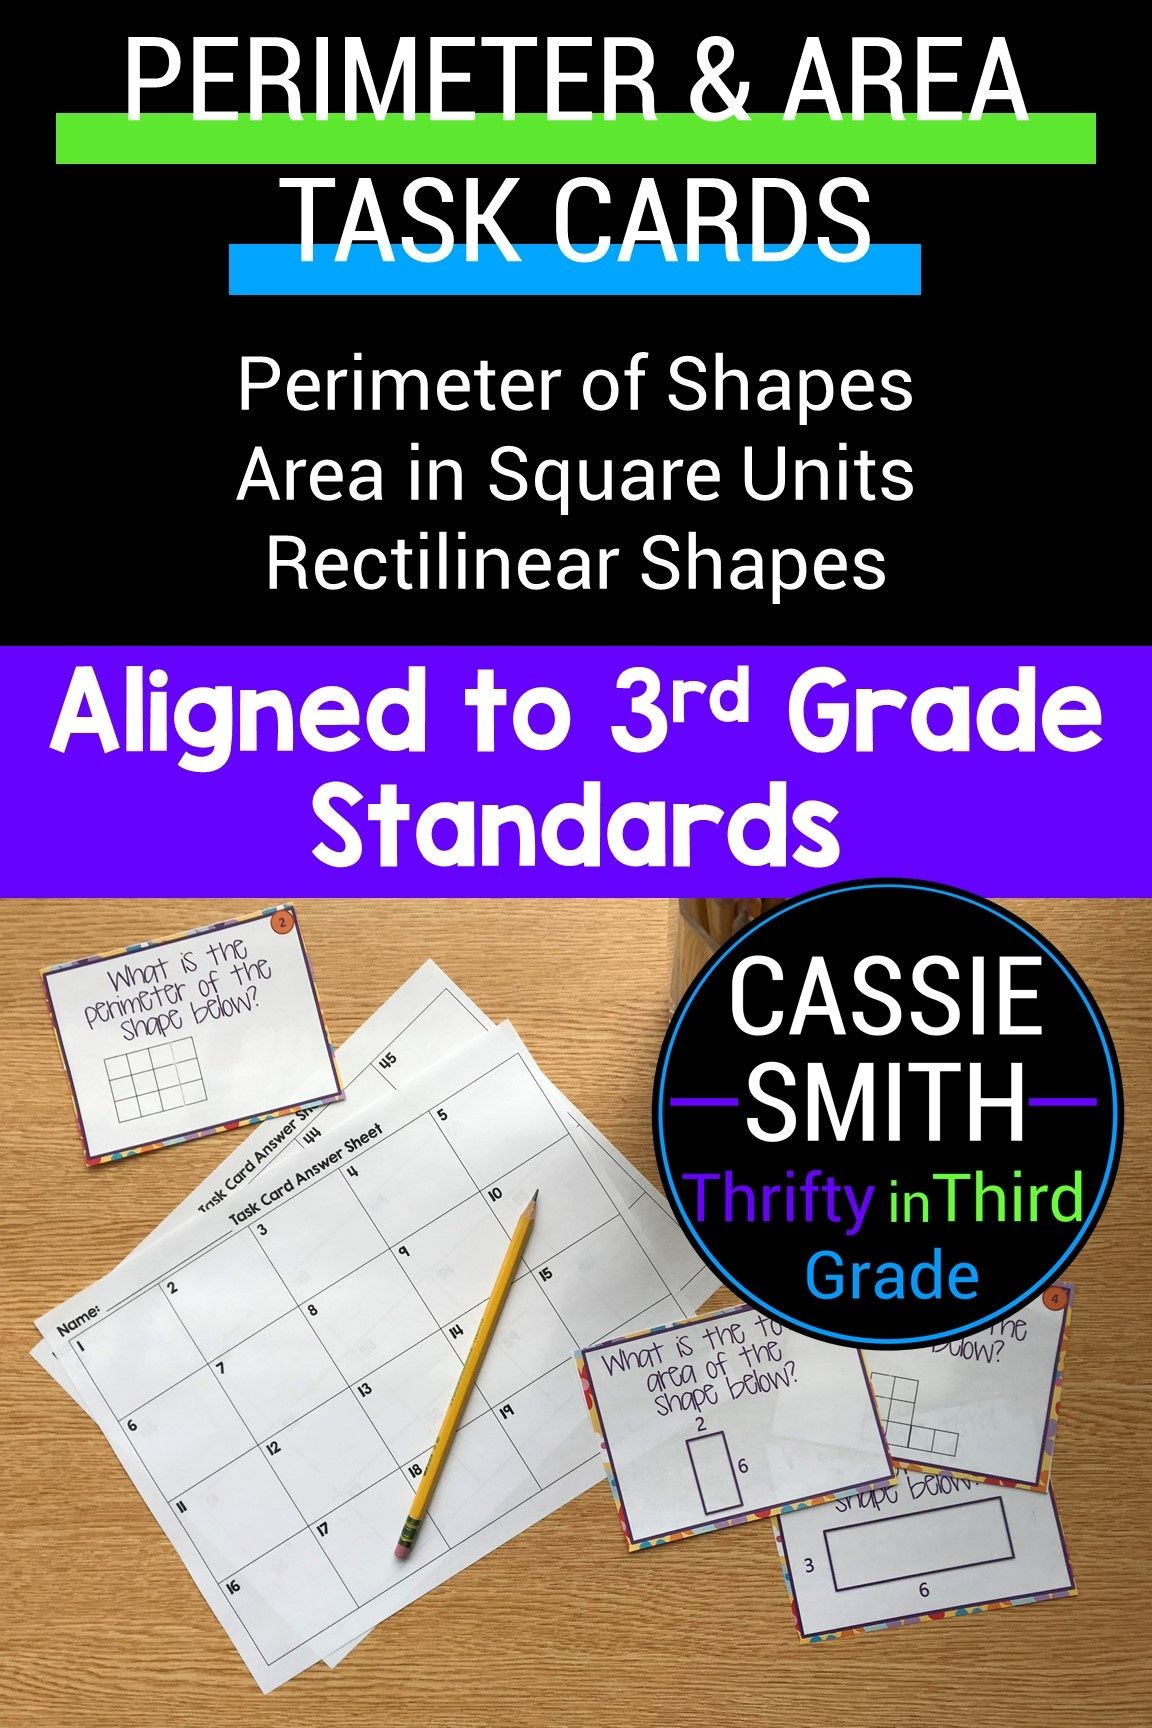 4th Grade Guided Math Unit 14 Perimeter And Area